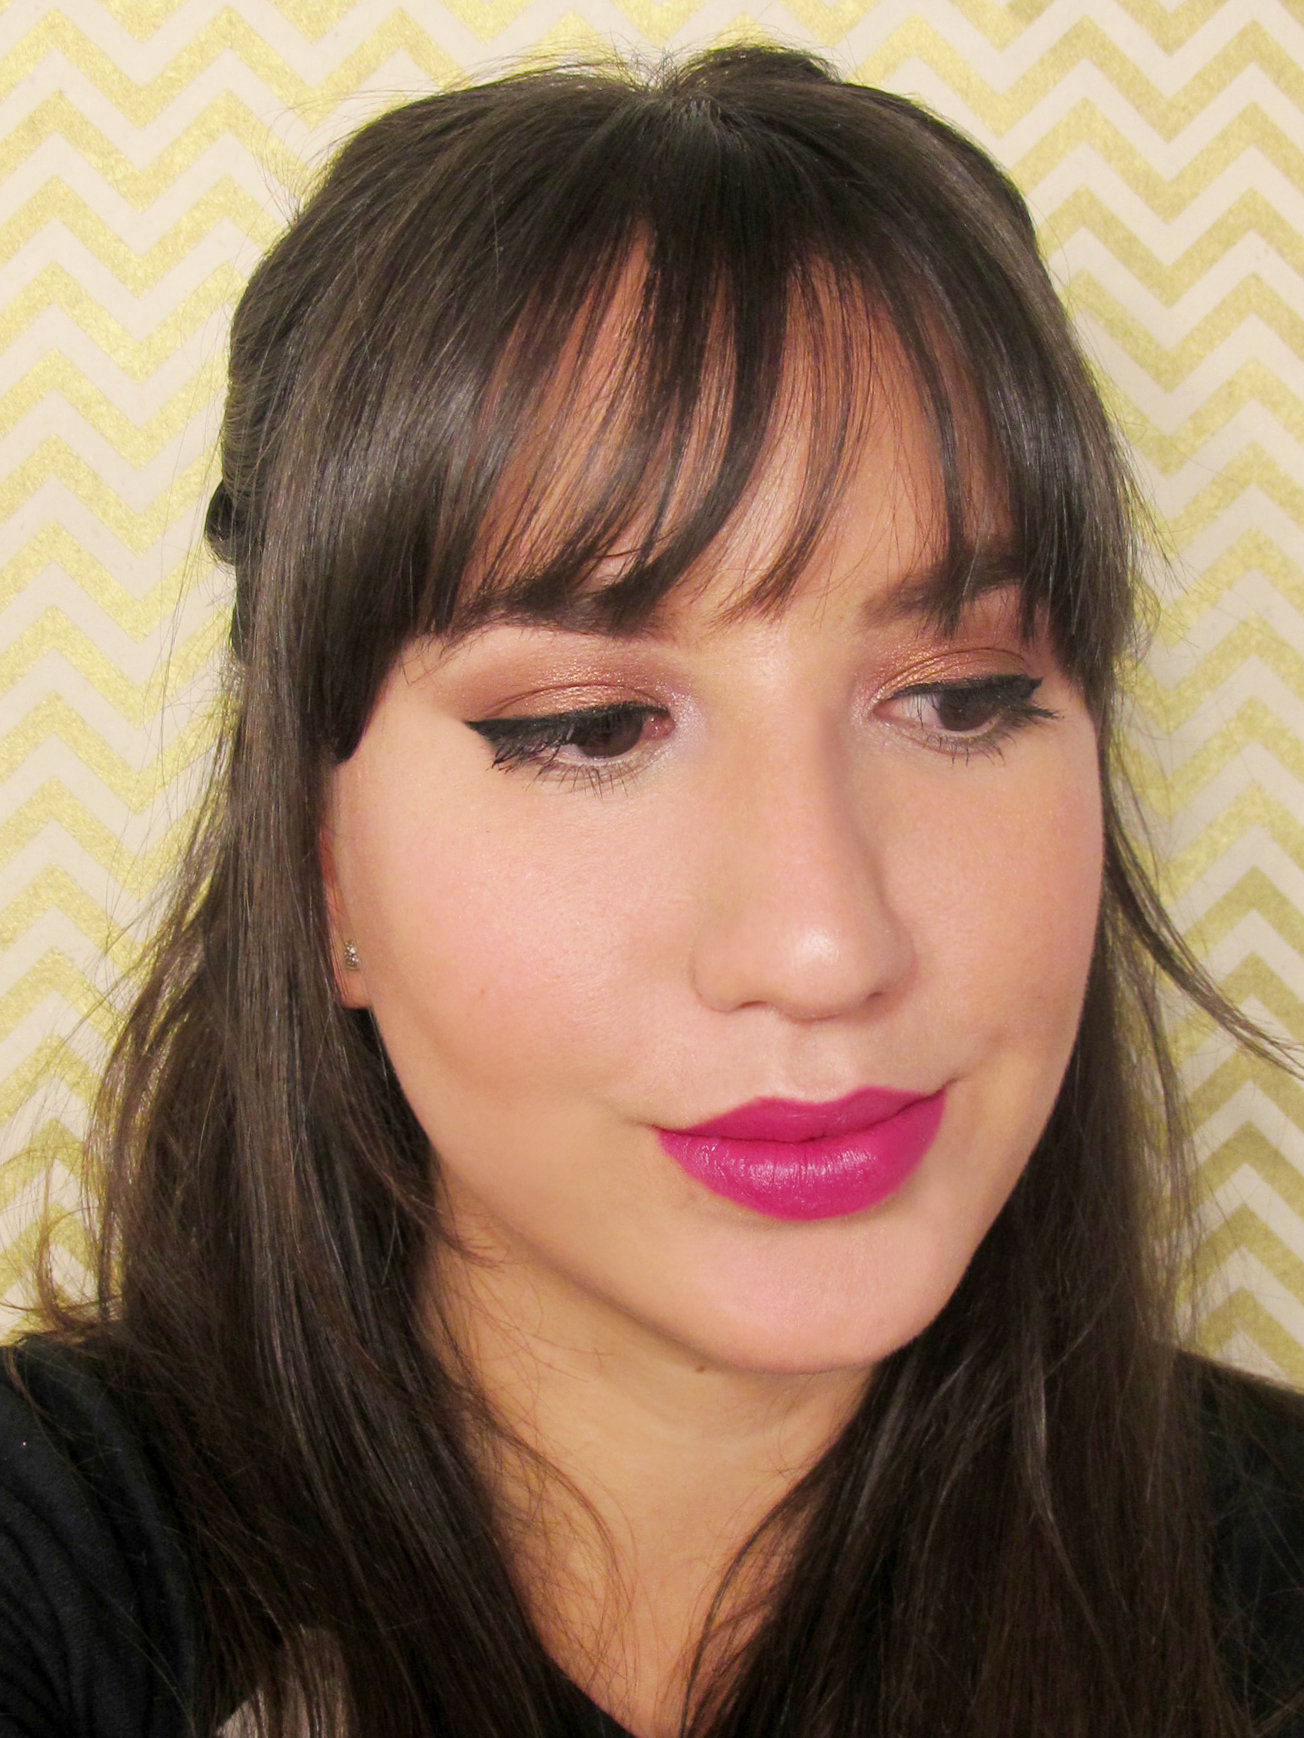 make-final-ano-natal-reveillon-maquiagem-beleza-tracta-blogs-divas-dupe-flat-out-fabulous-nars-naked-3-makeup-beauty